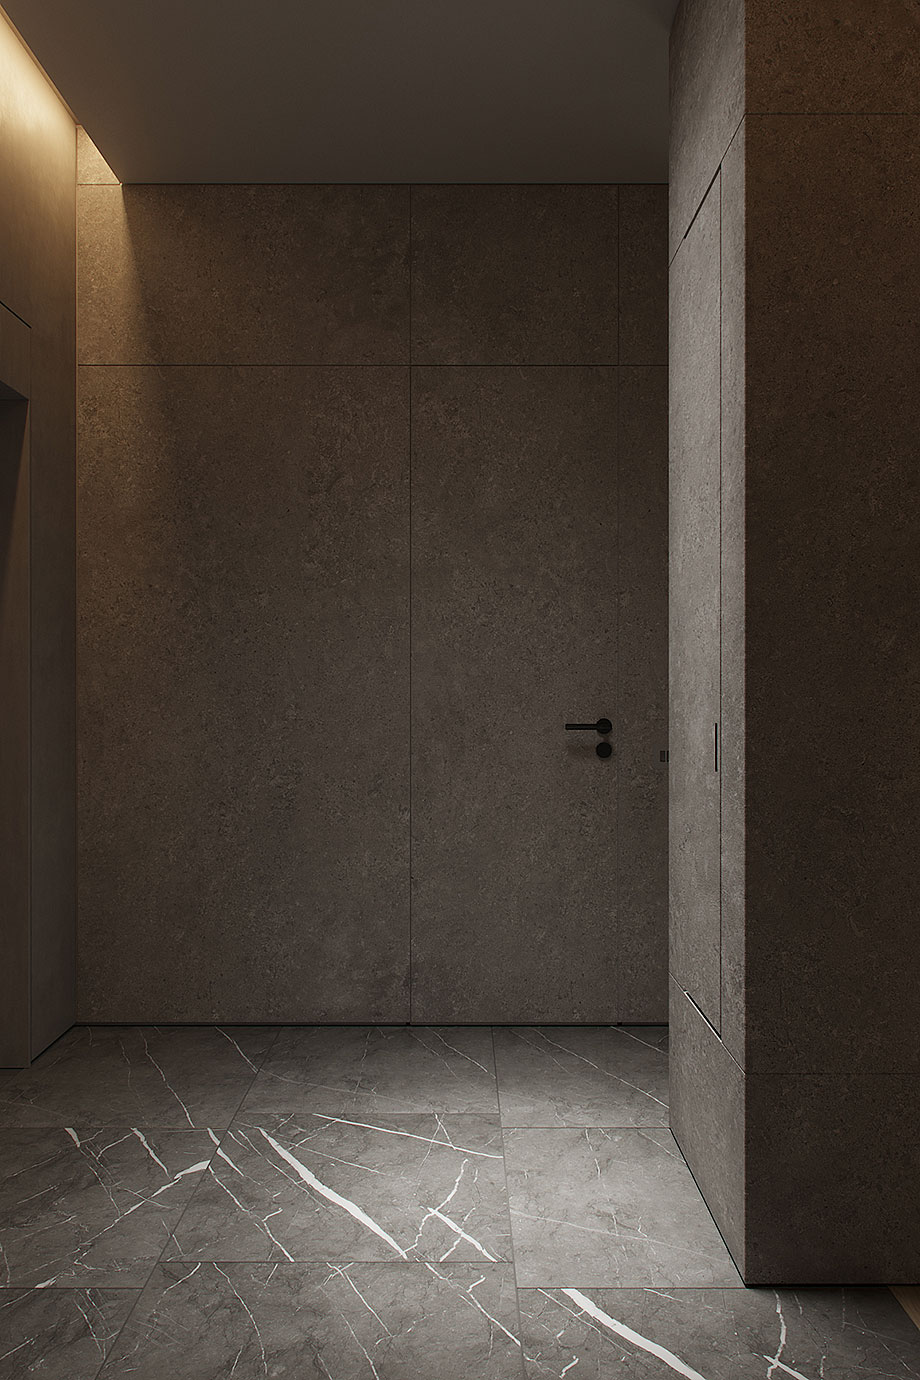 apartamento en moscu de kodd bureau (9) - foto daria koloskova